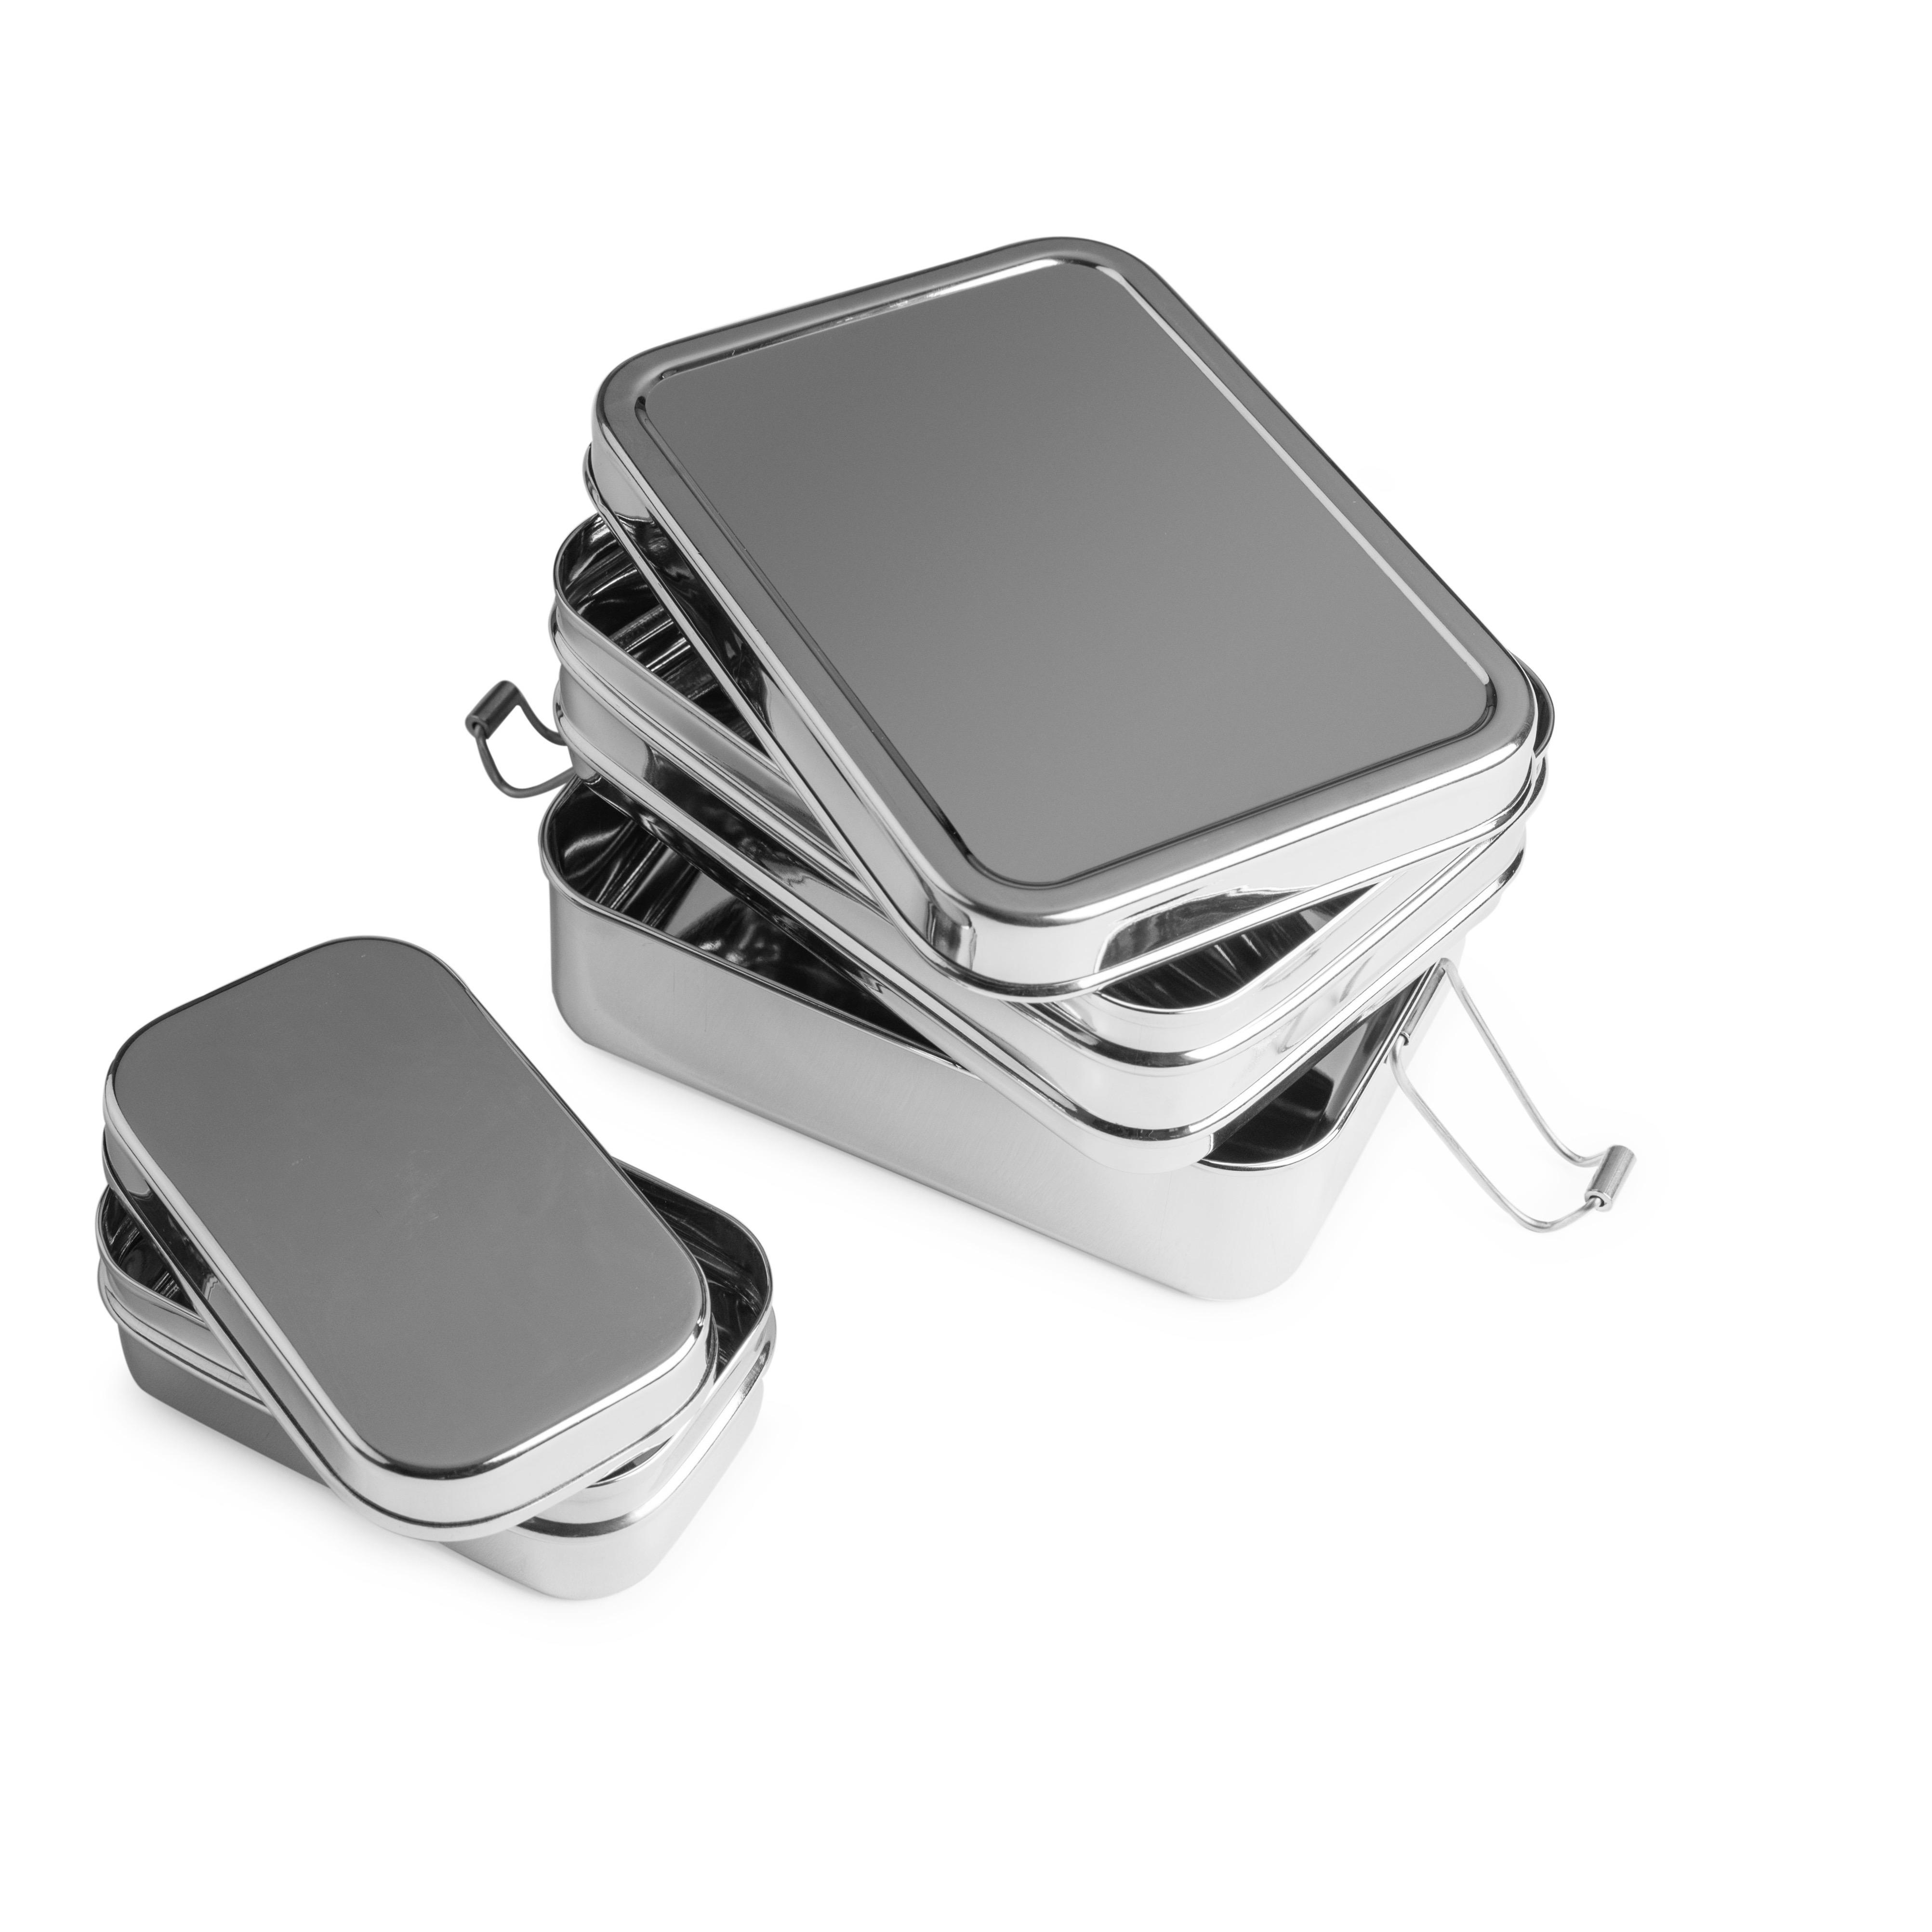 brotzeit lunchboxen 3in1 big three in one brotdose jausenbox aus edelstahl 100 bpa frei fest. Black Bedroom Furniture Sets. Home Design Ideas